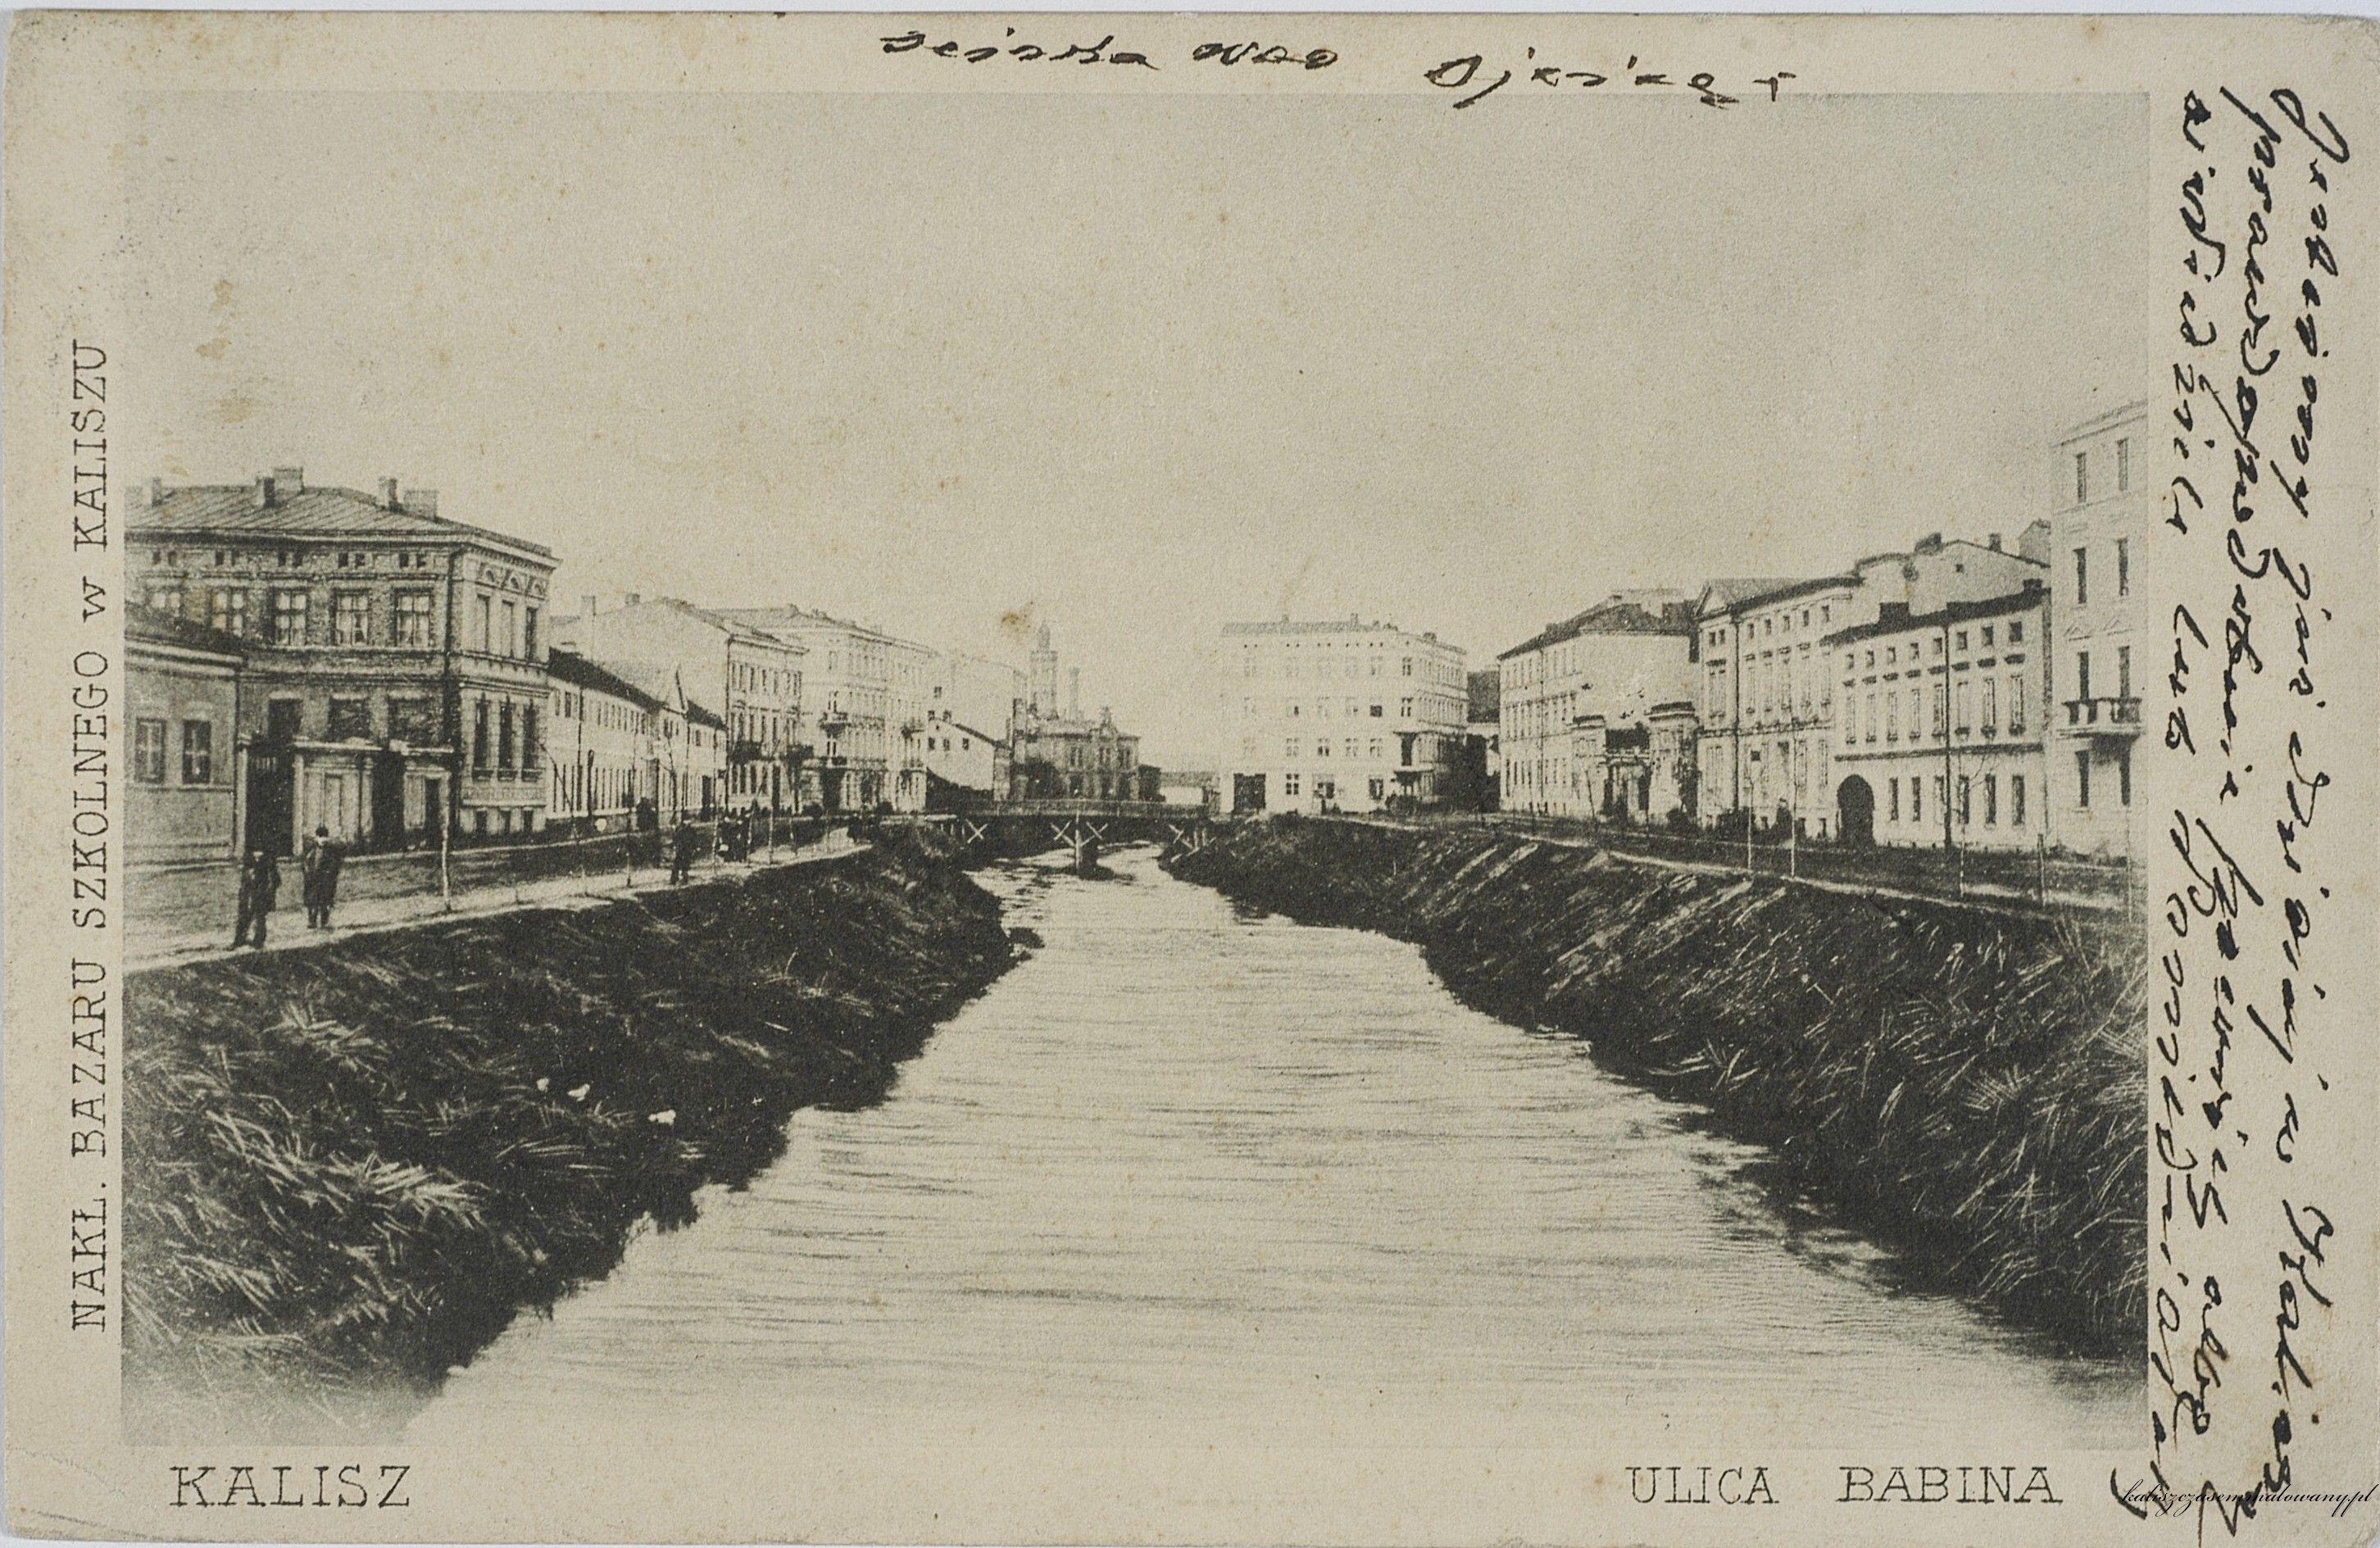 Ulica Babina